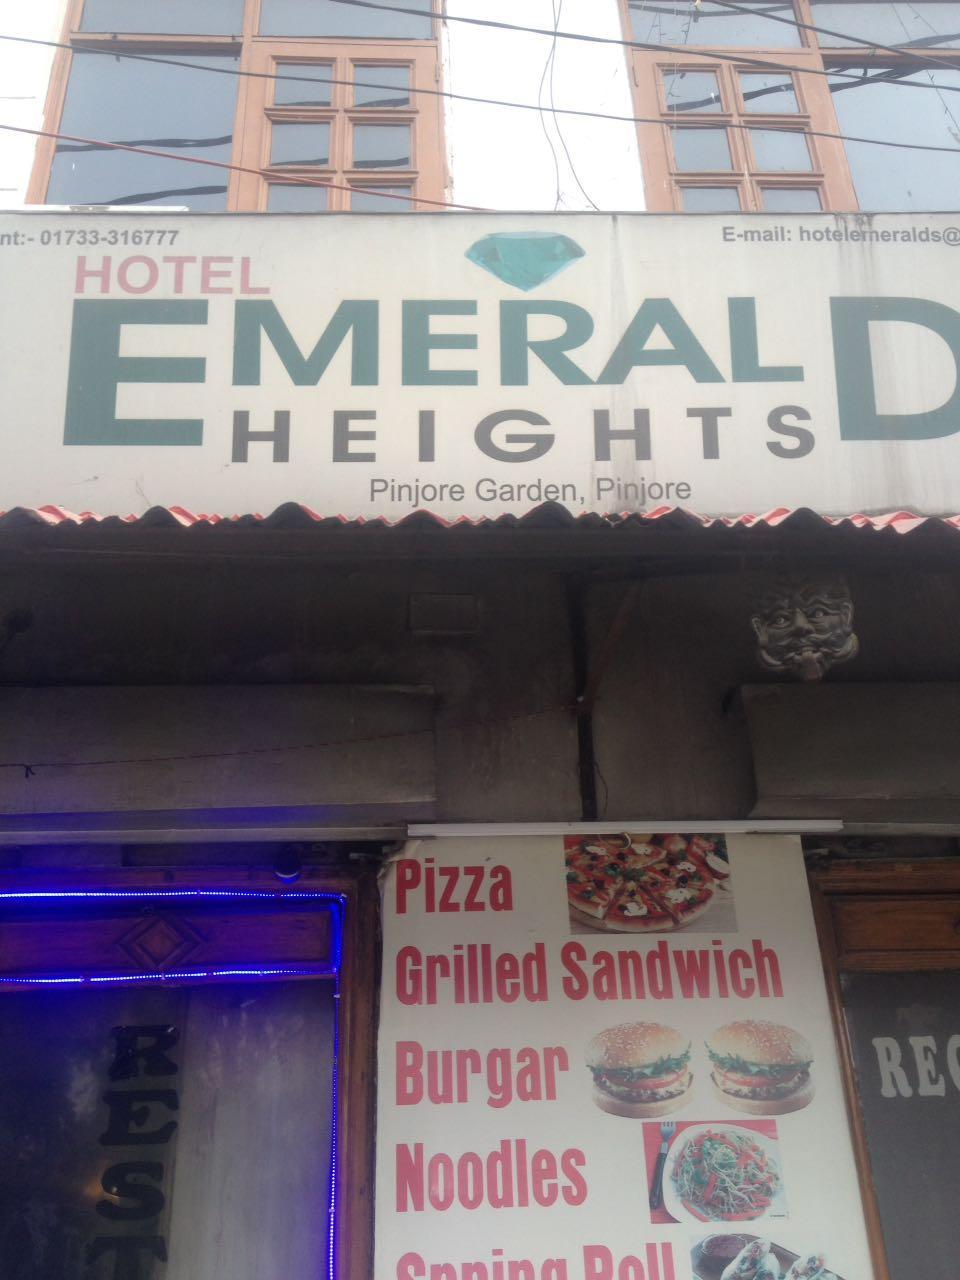 Hotel Emerald Heights Pinjore